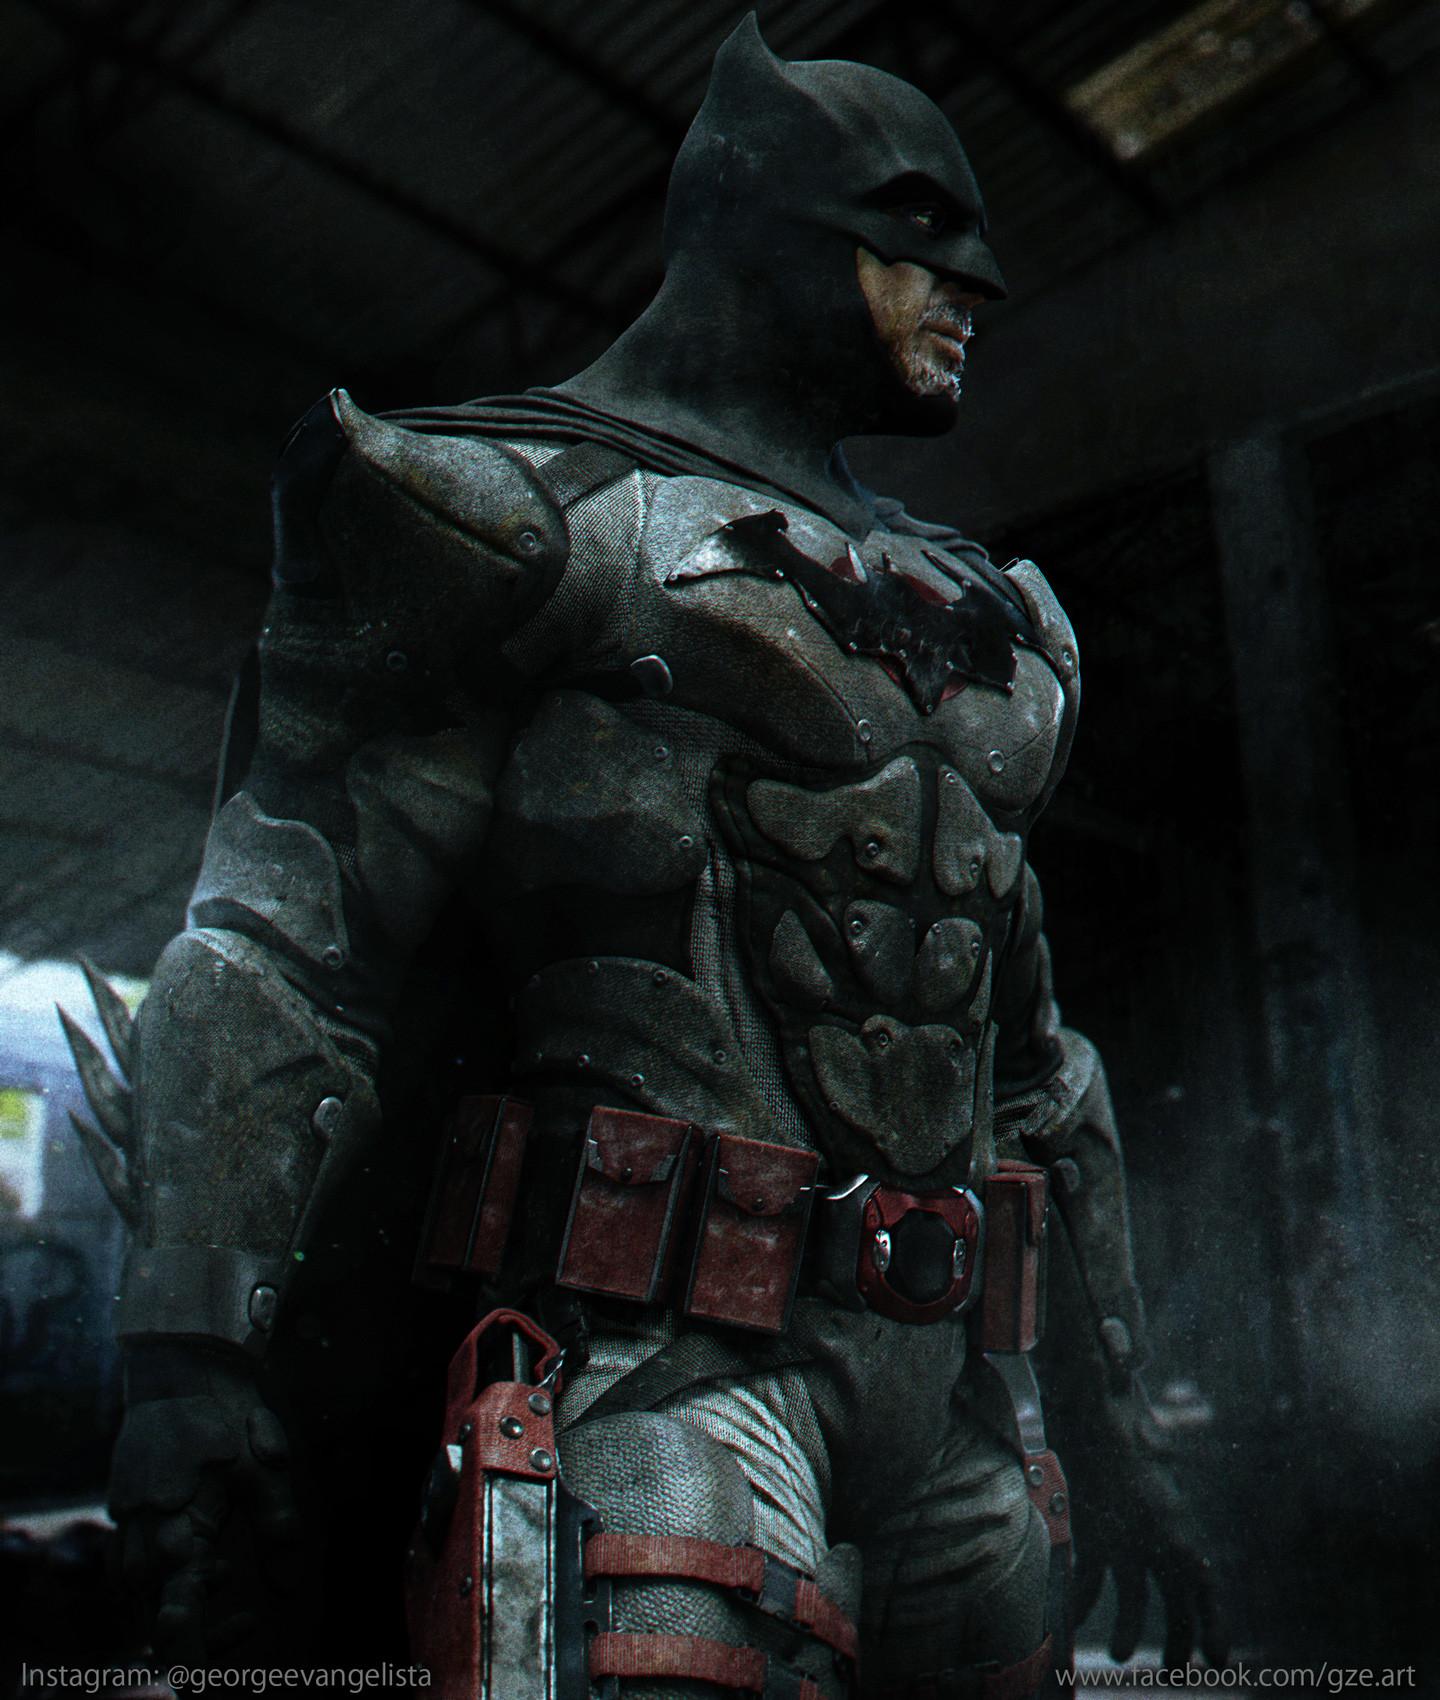 George evangelista thomas wayne batman